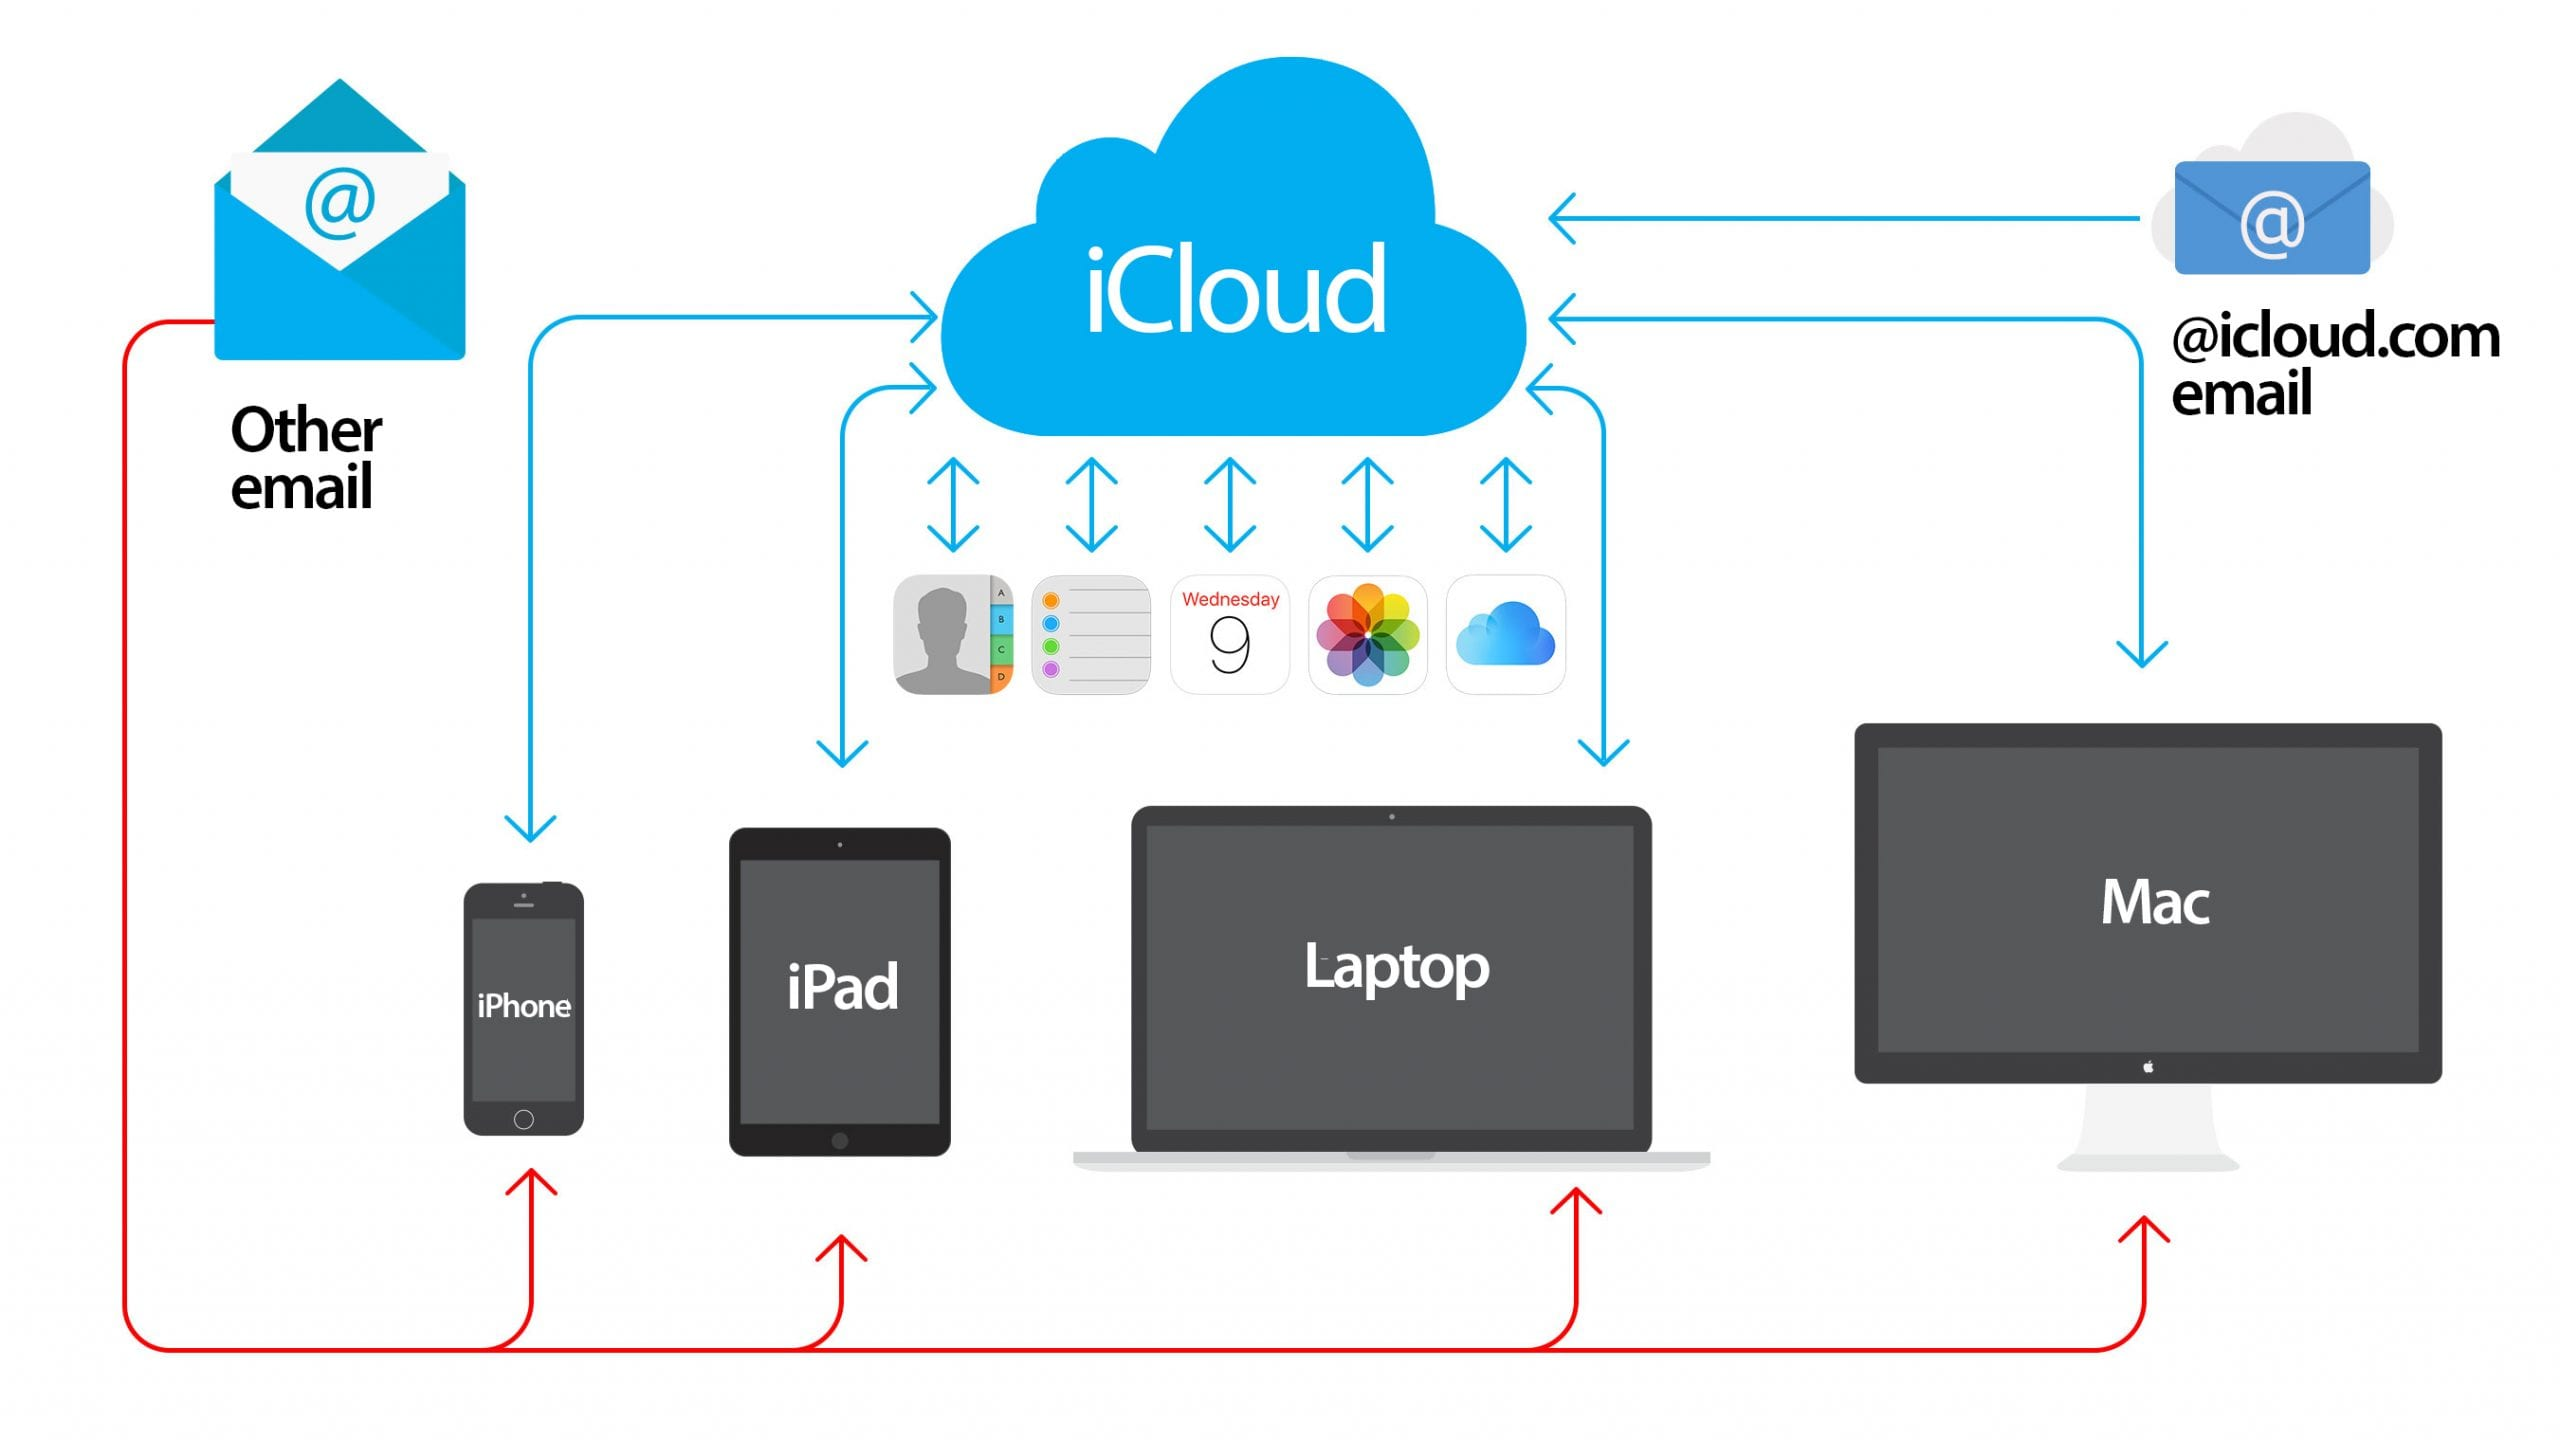 Come funziona iCloud